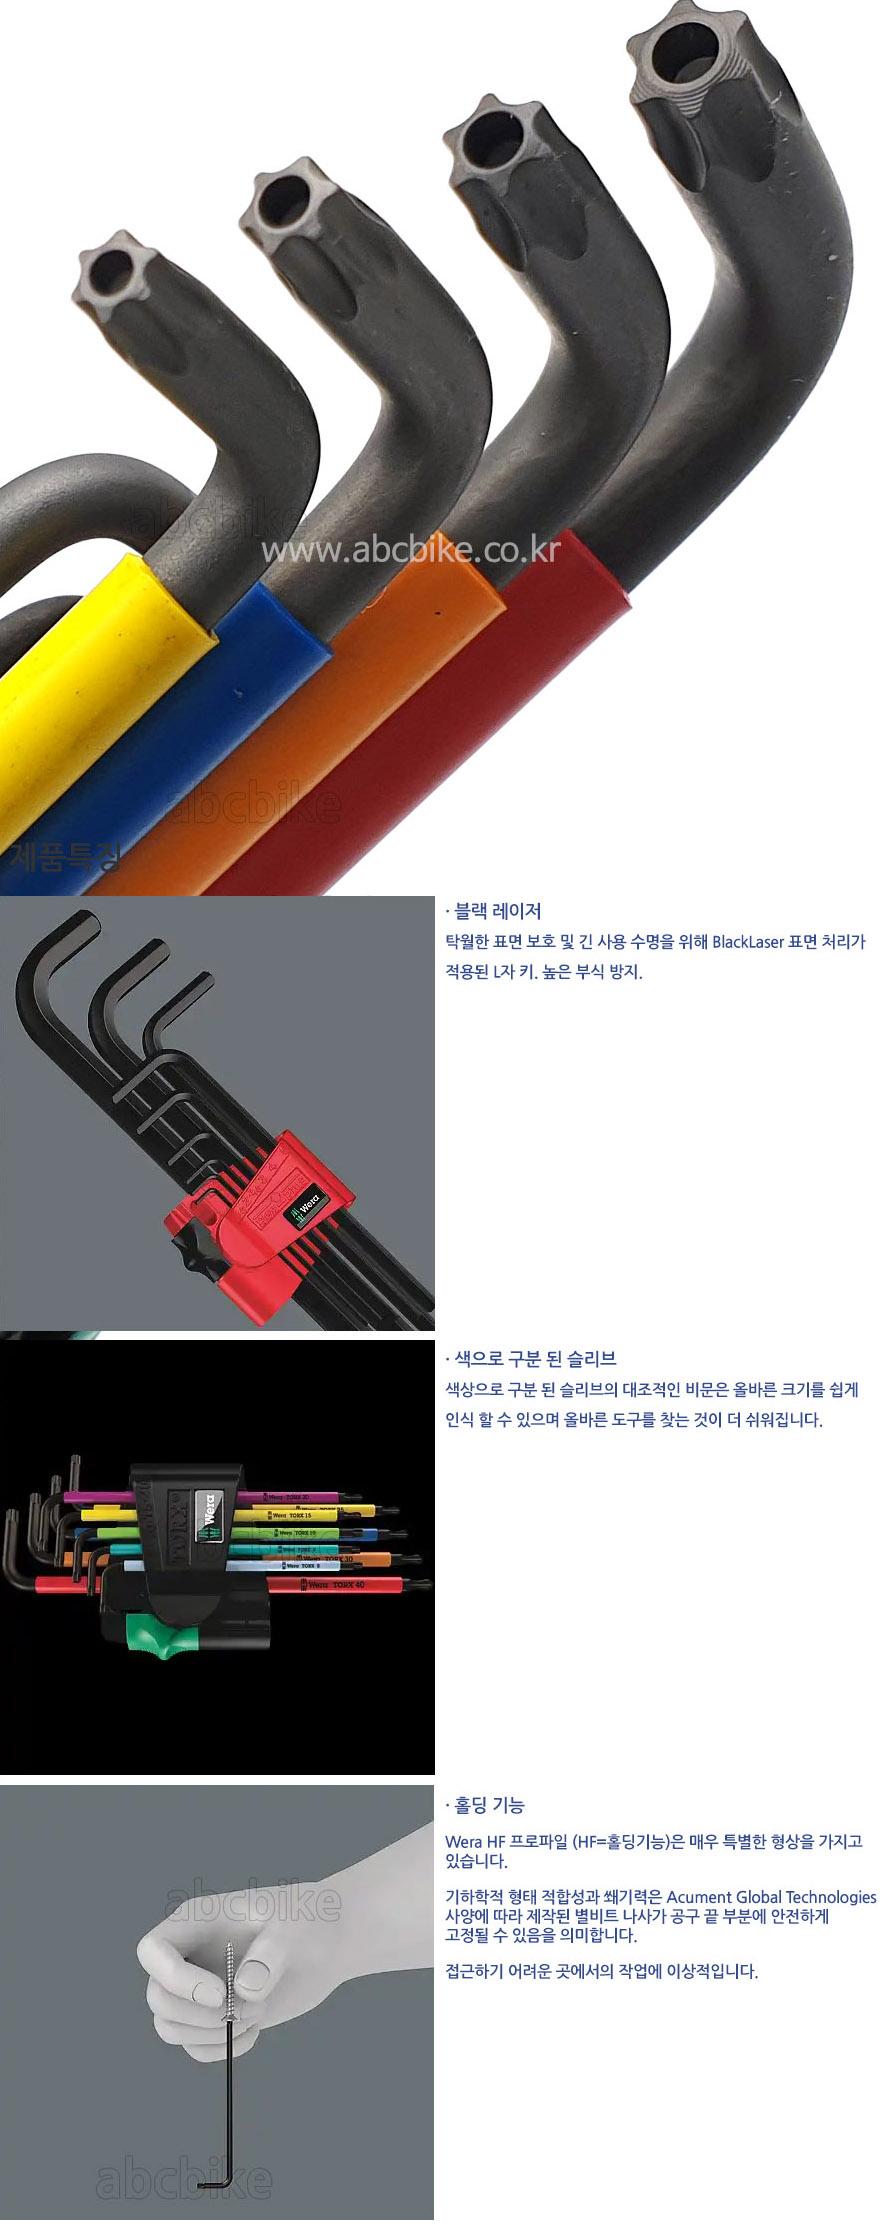 WERA (베라) 9pcs  롱홀별비트 멀티컬러 L렌치 세트  967 SPKL/9 Multicolour SB